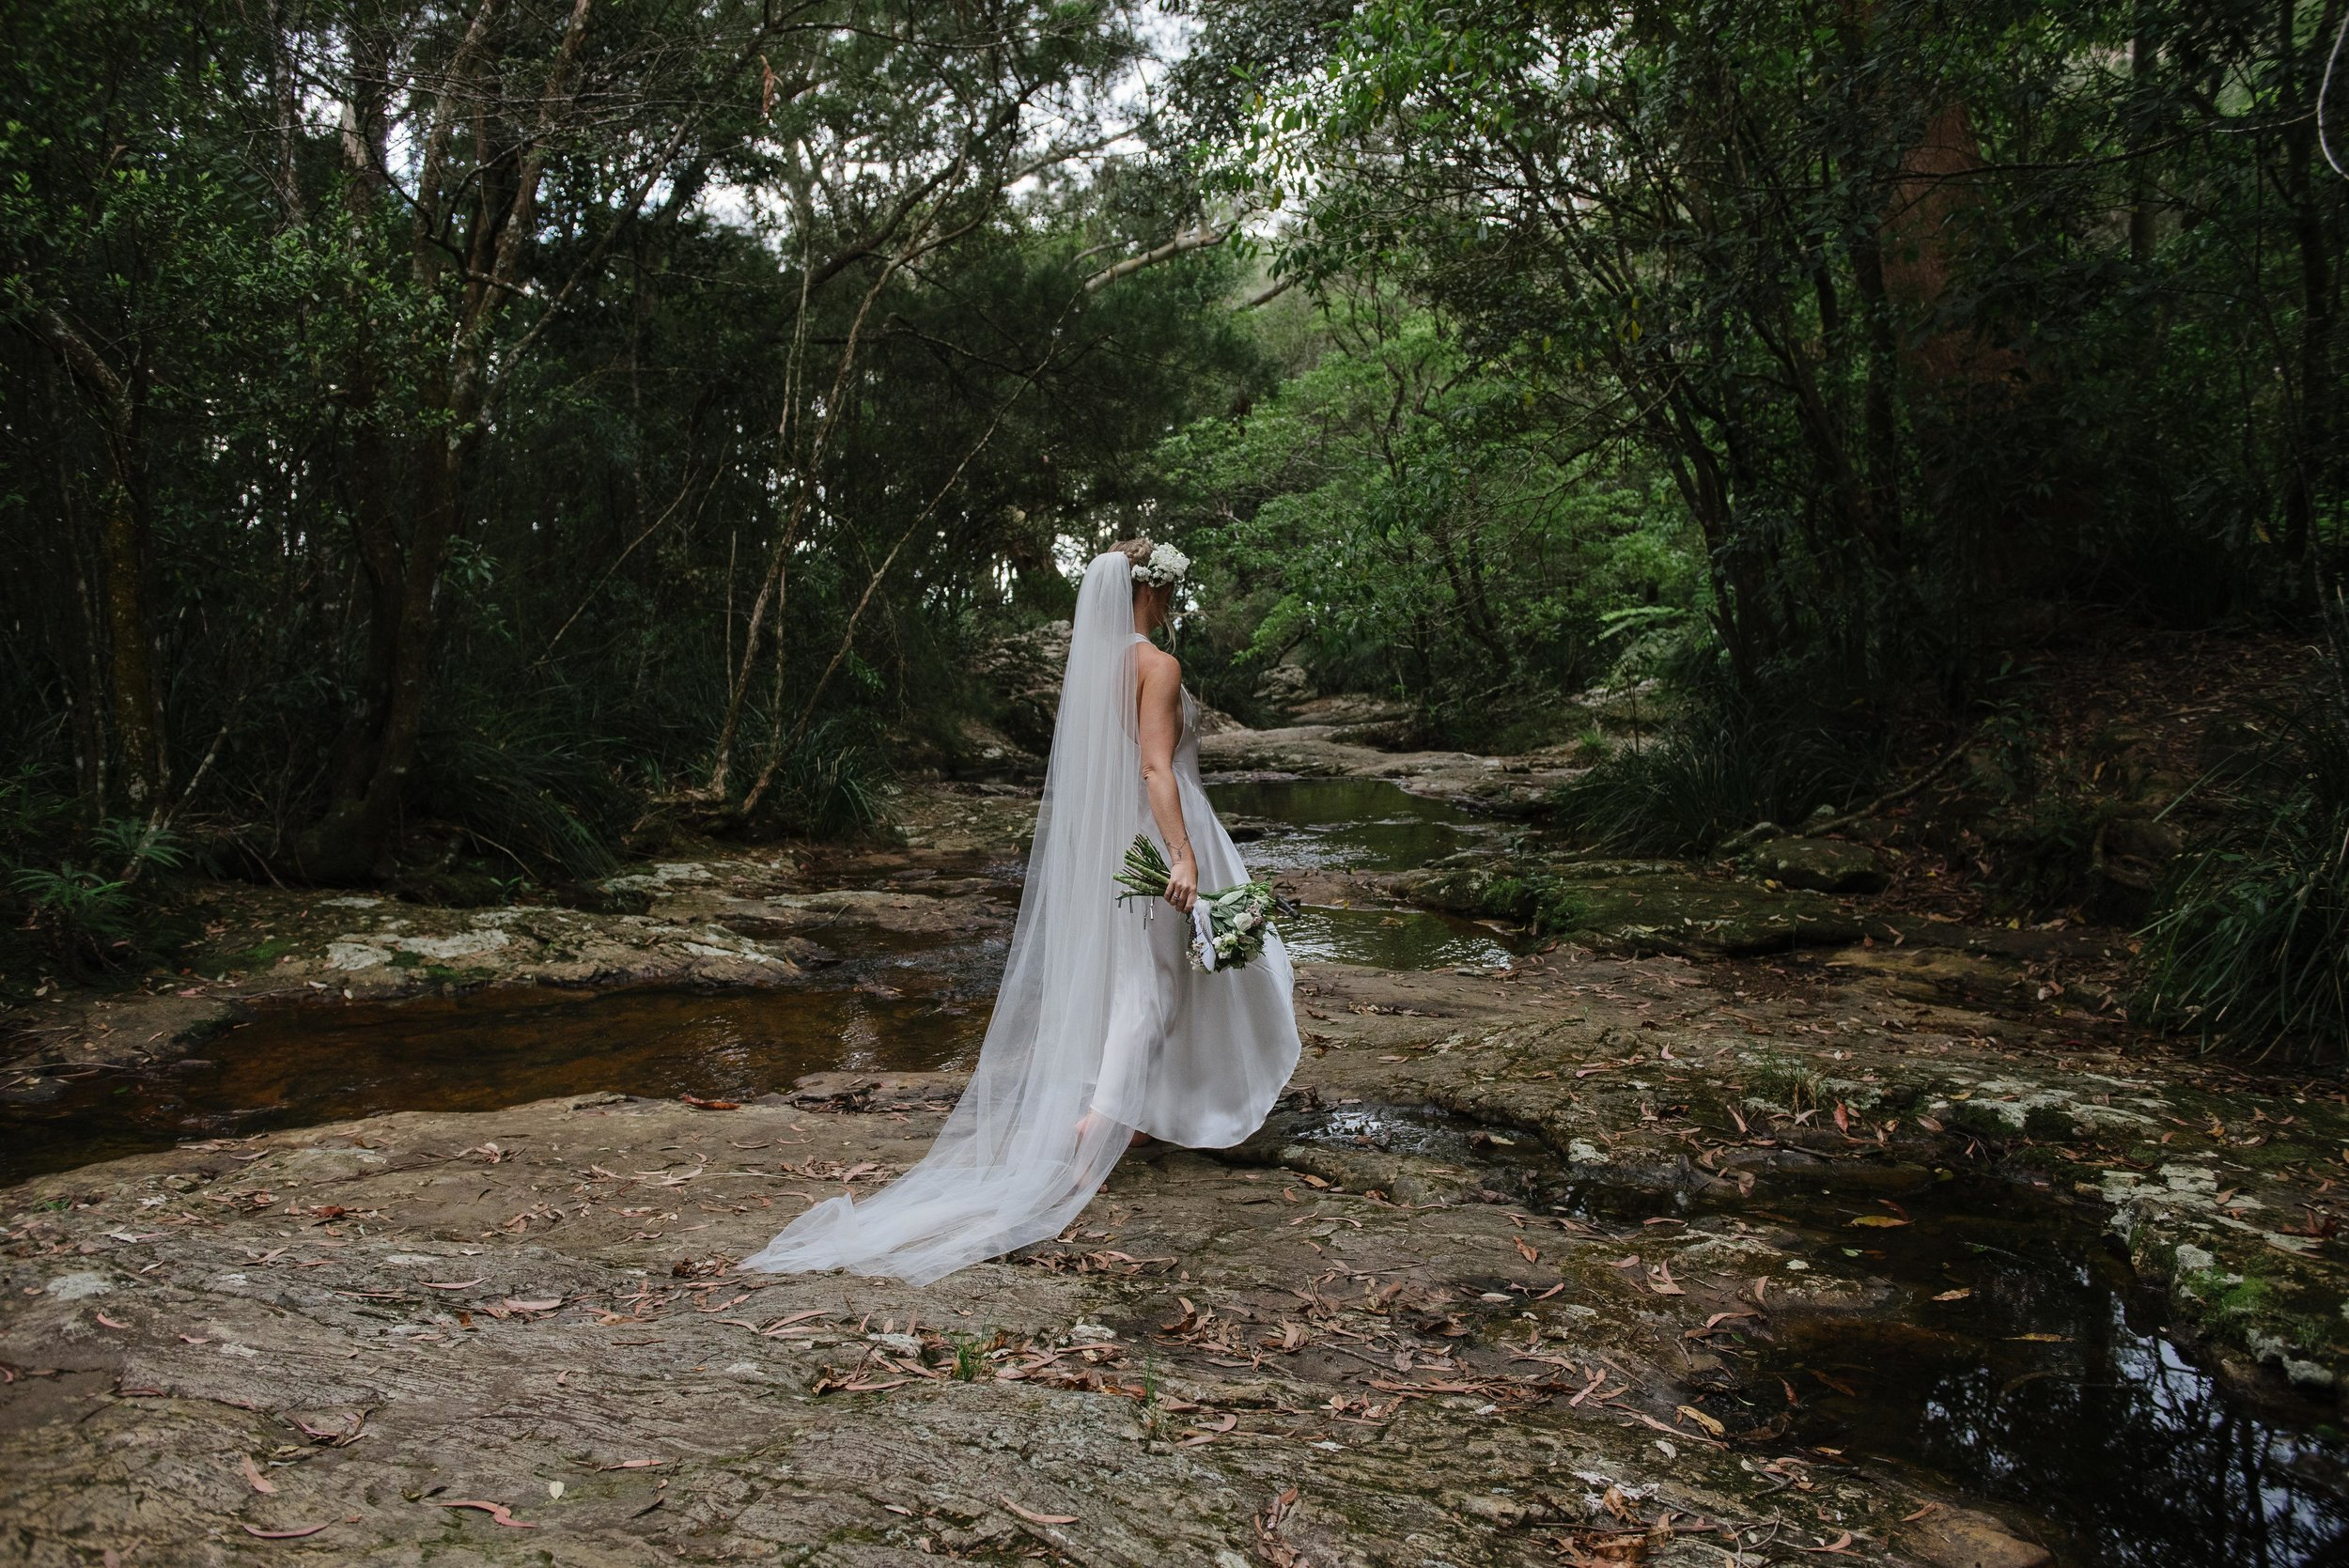 Carla and Luke- wedding photographer, byron bay wedding and family photographer, tweed heads wedding and family photography-346.jpg